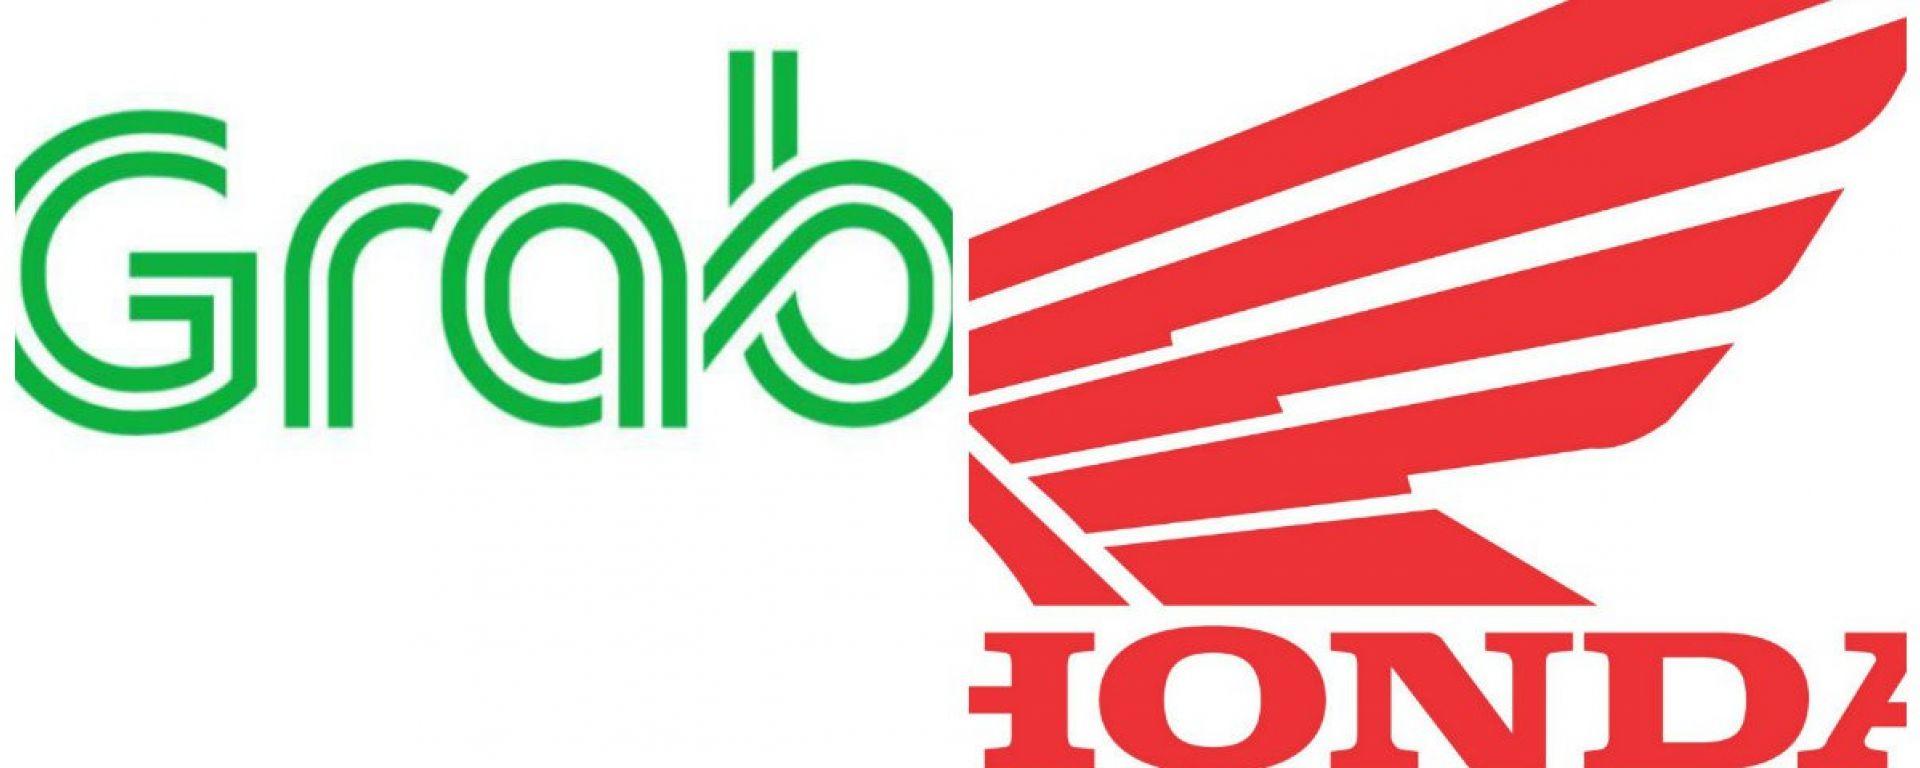 Accordo Grab-Honda per moto-taxi